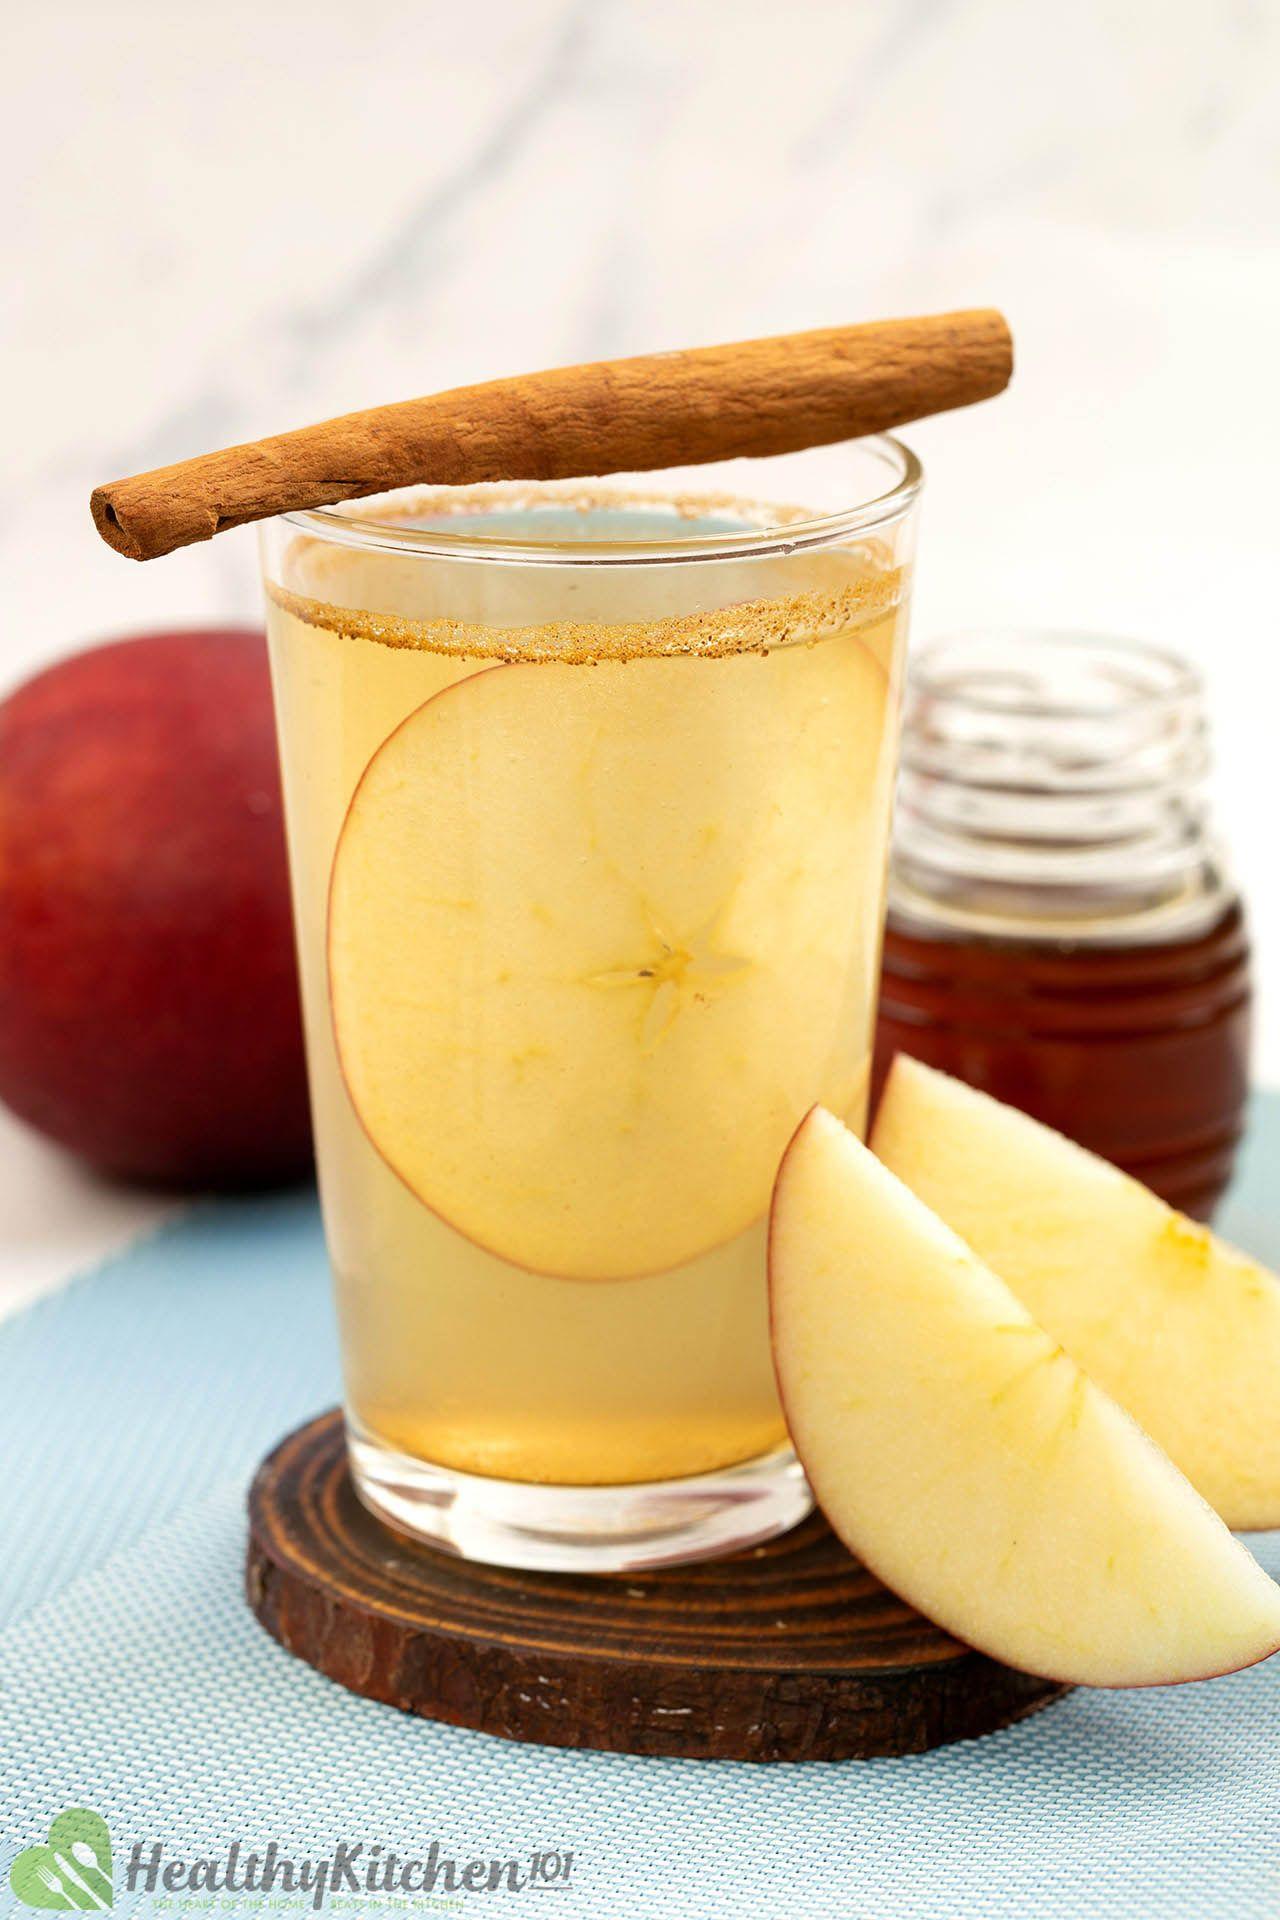 homemade apple cider vinegar and honey last